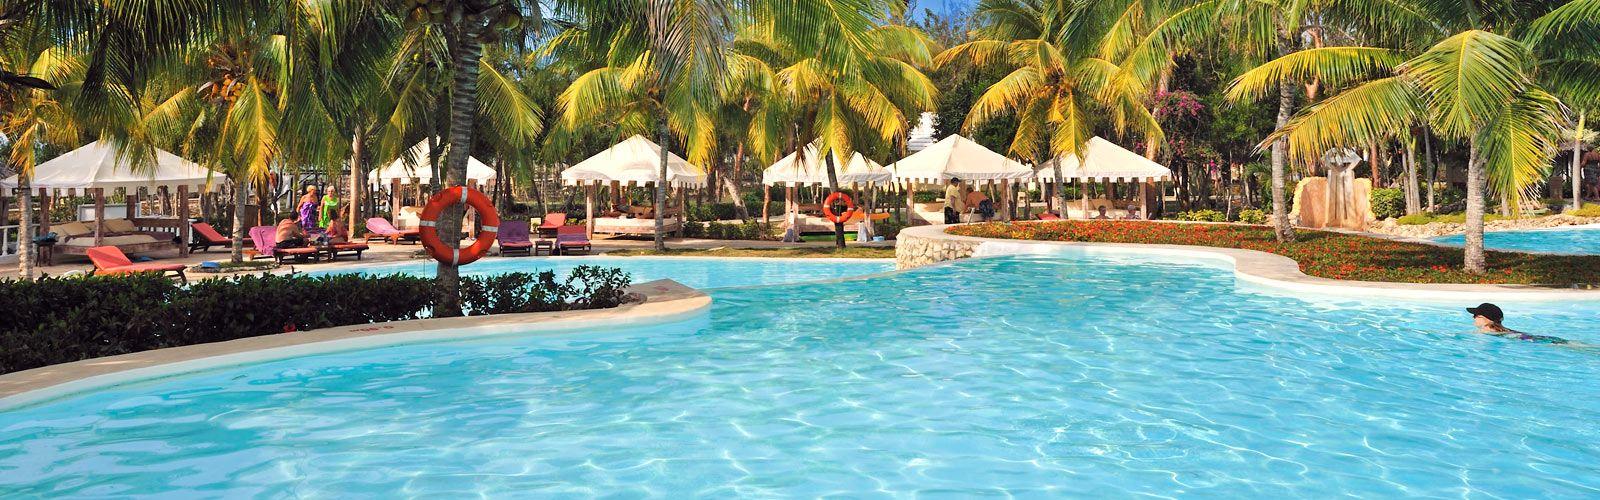 Paradisus Río De Oro Resort Spa Outdoor Resort Resort Spa